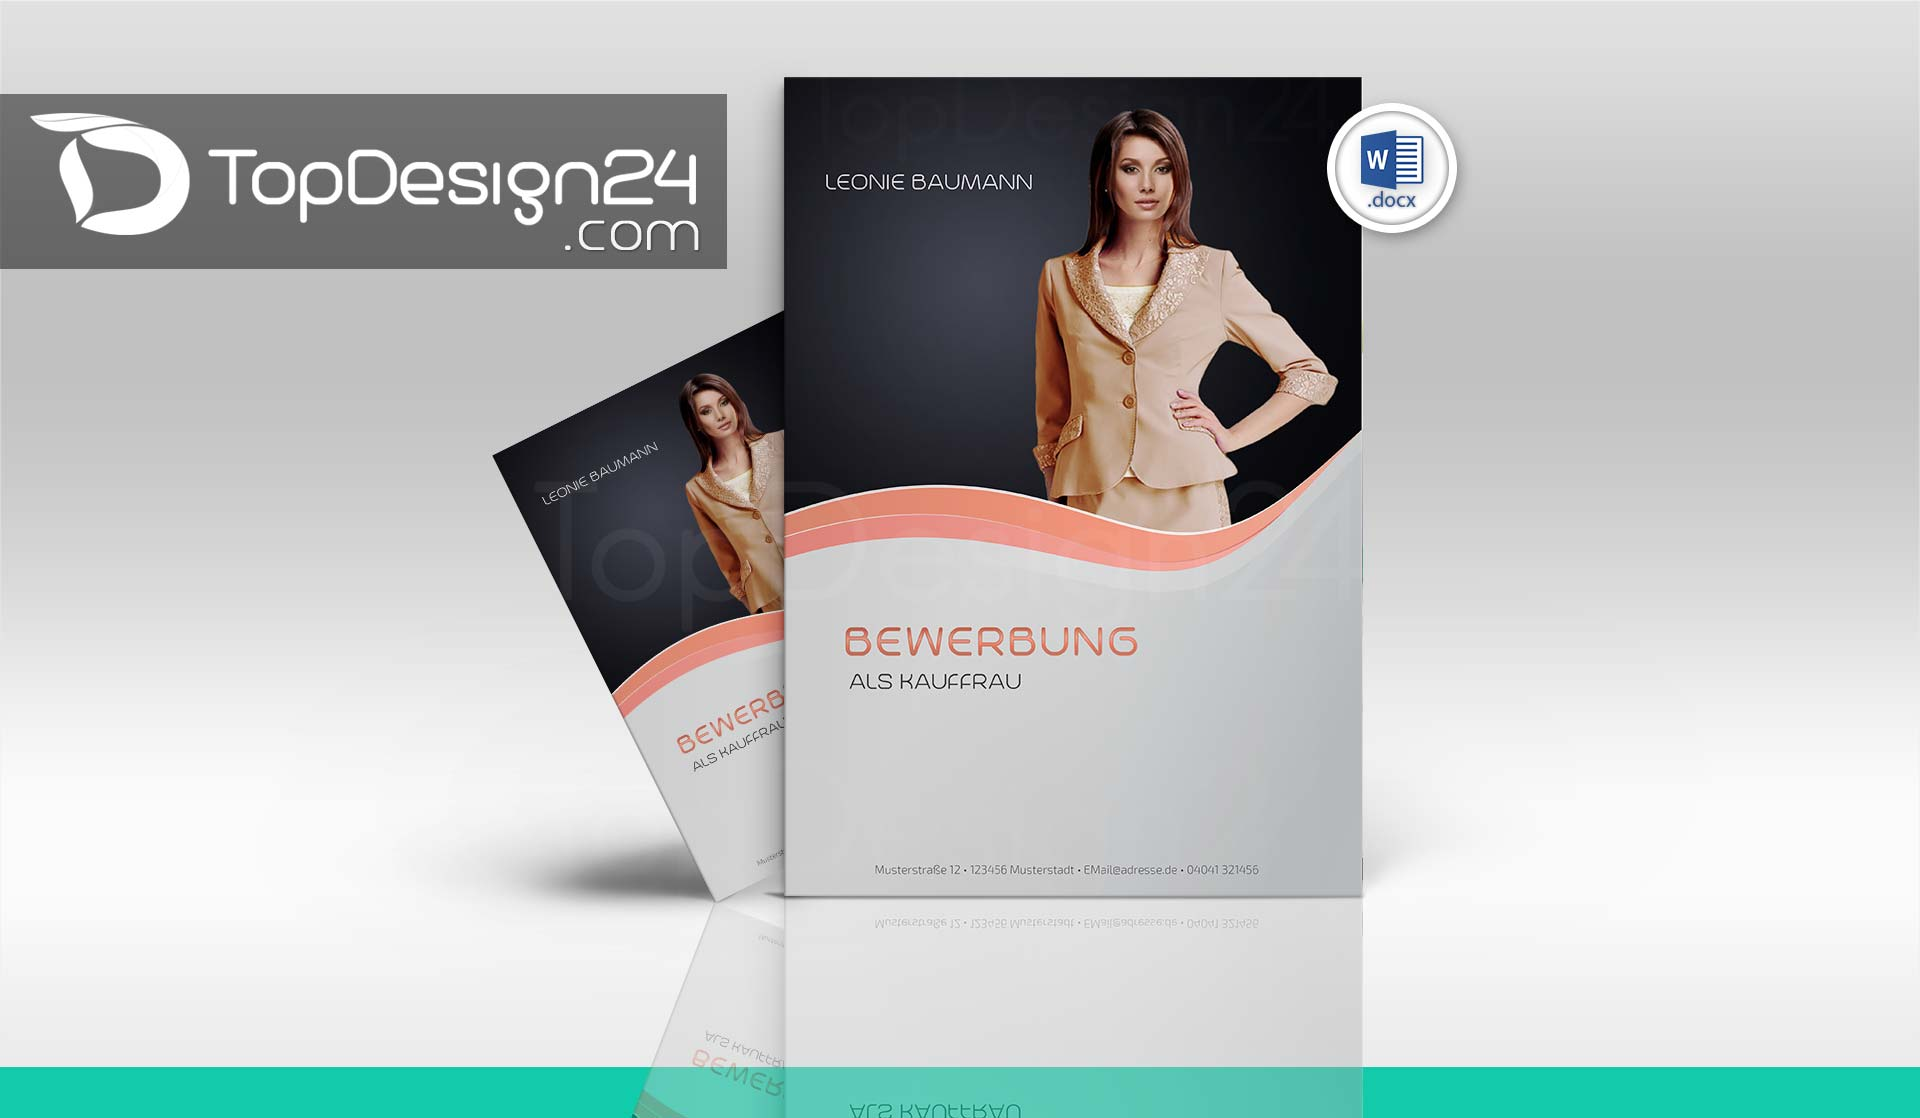 Bewerbung Muster Download Topdesign24 Deckblatt Lebe